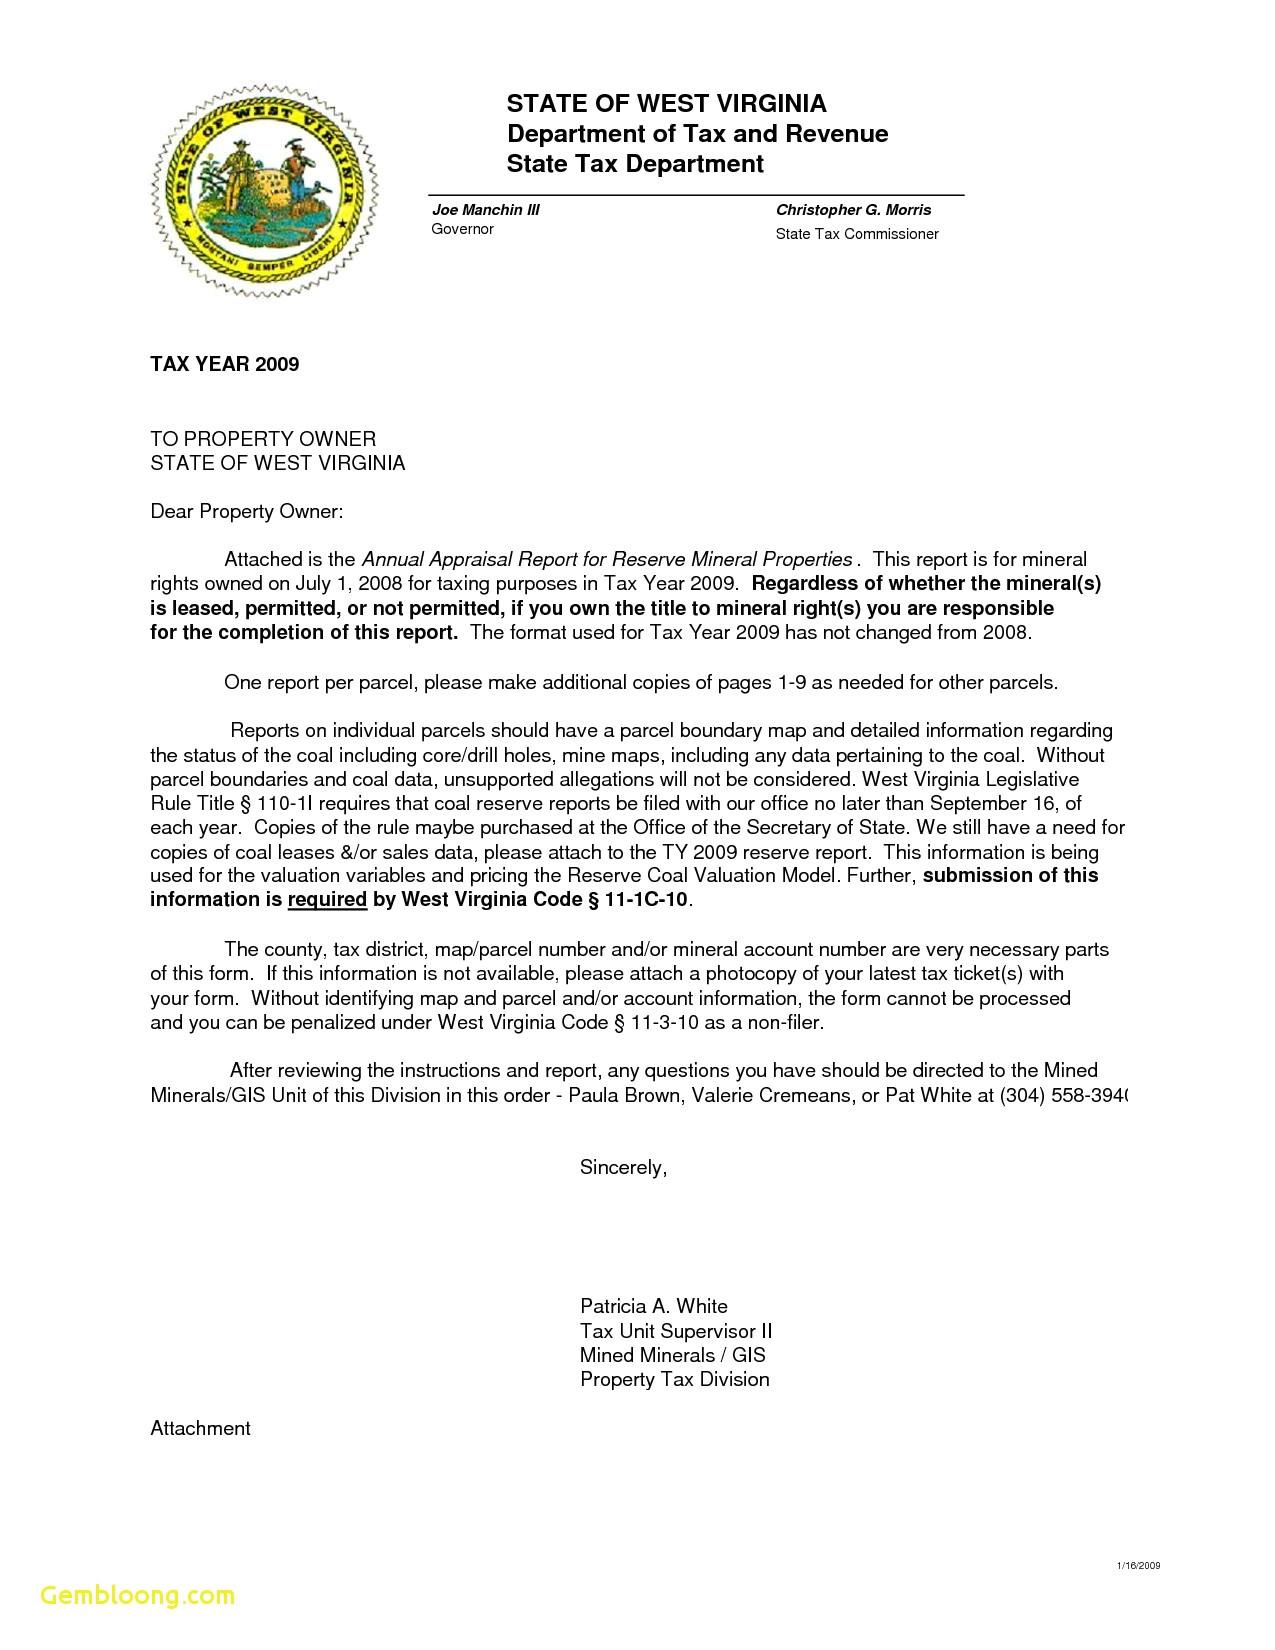 employer letter format ilr application